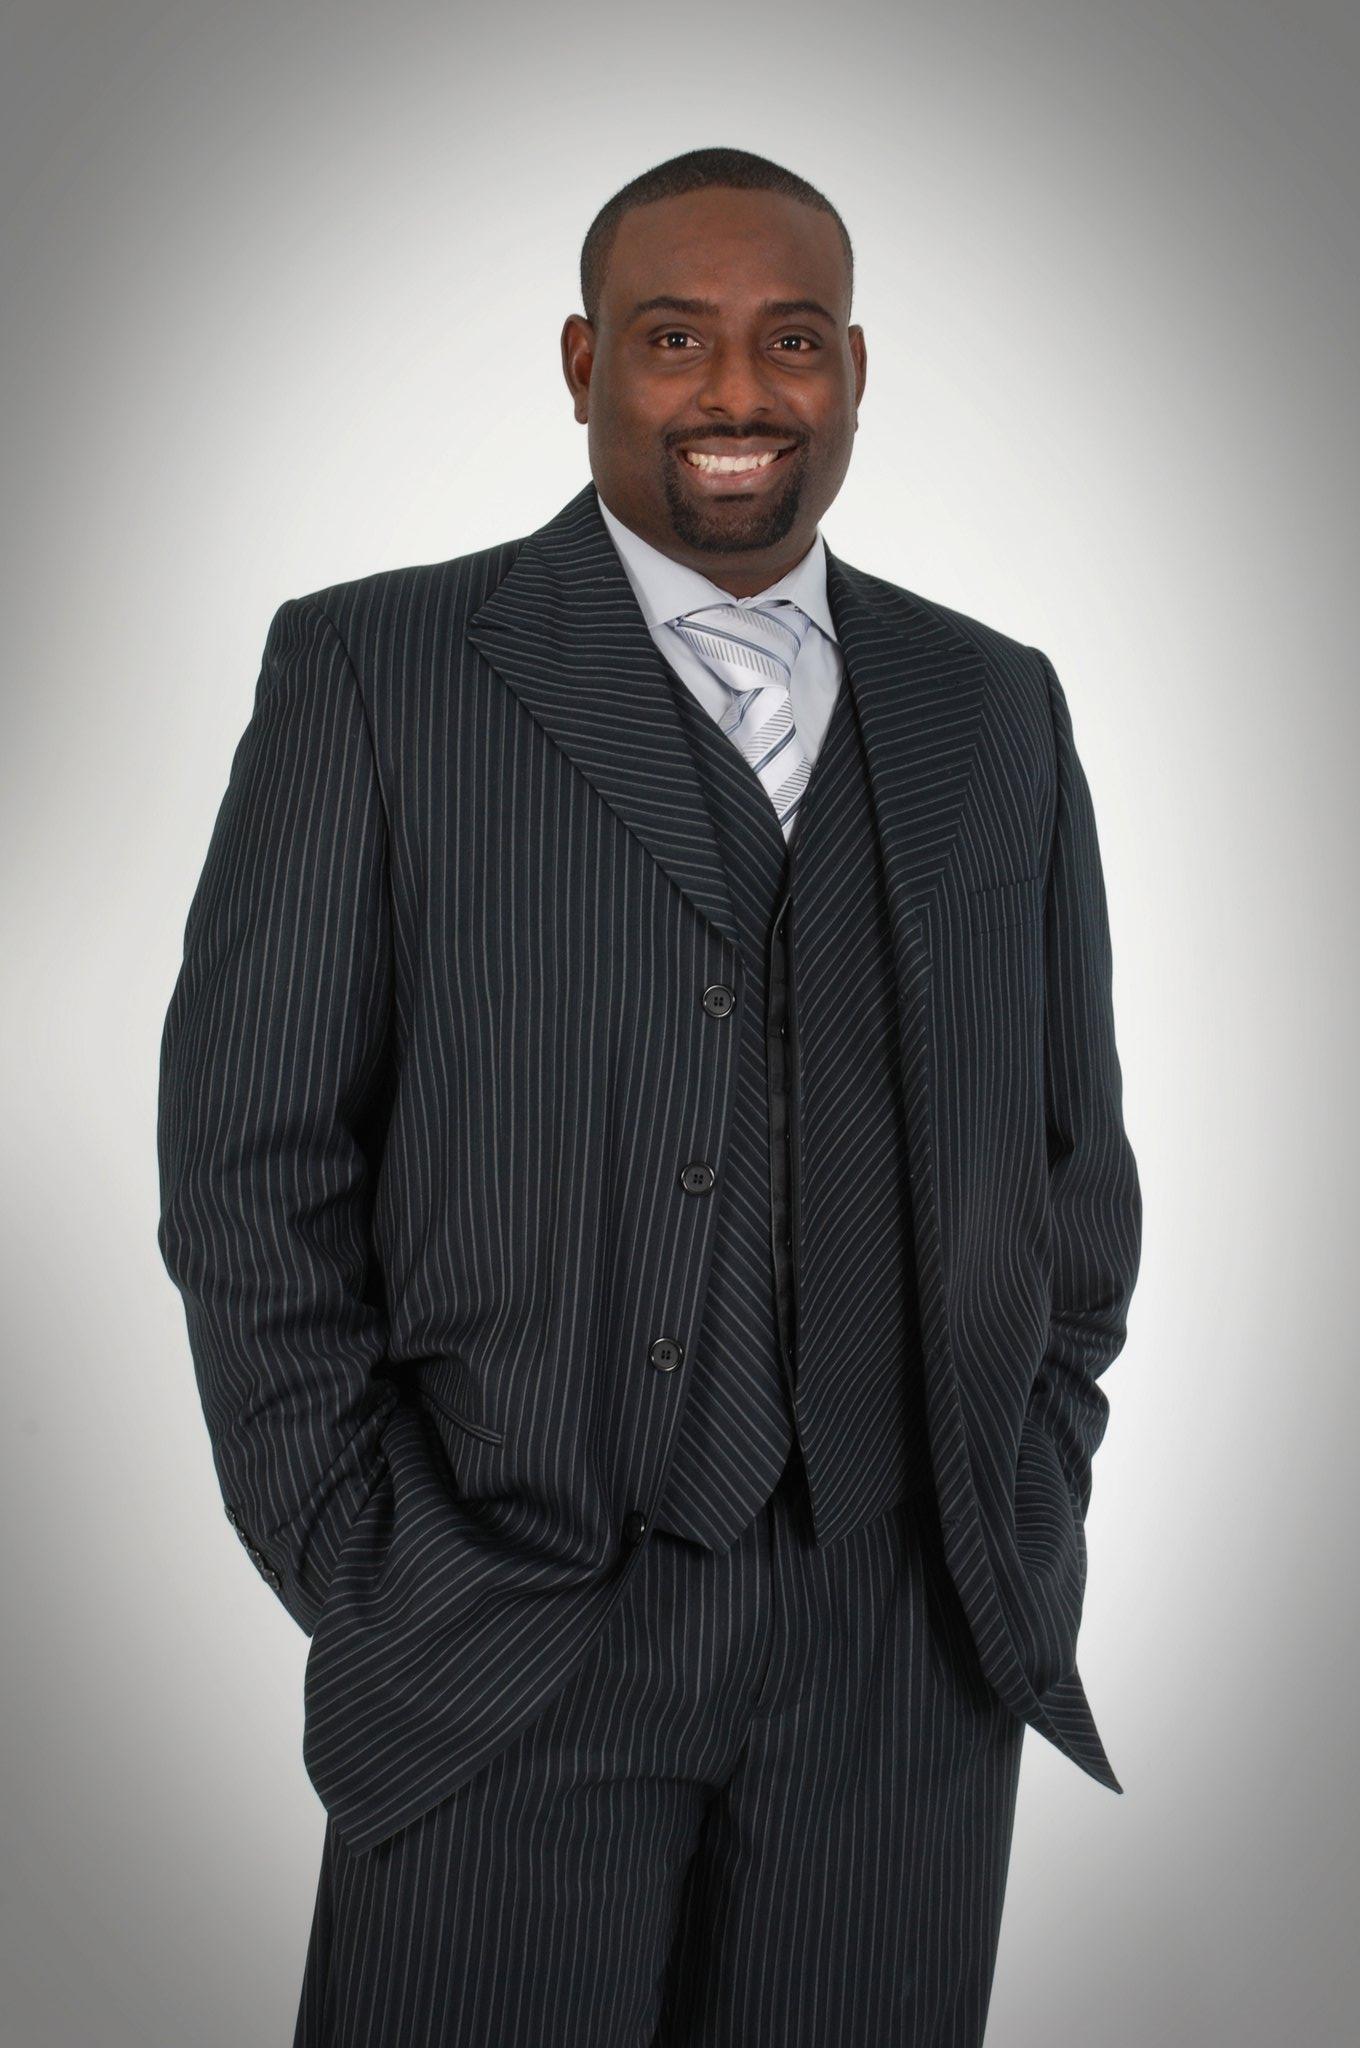 Pastor Travis Staggs